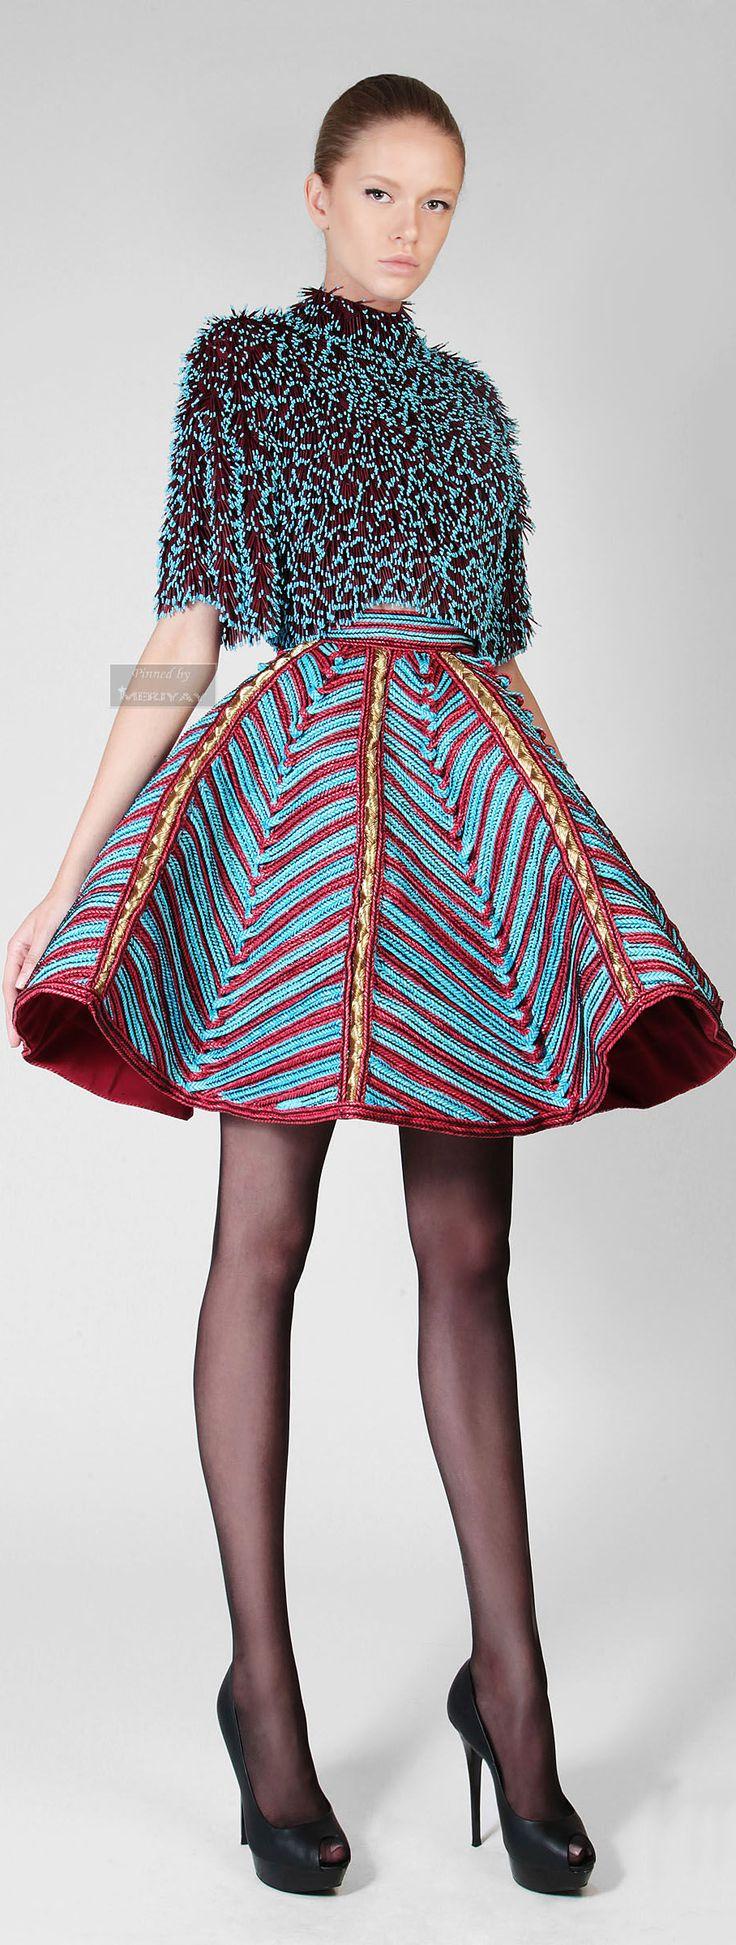 Rami Kadi - Just a great mix of texture. ~Latest African fashion, Ankara, kitenge, African women dresses, African prints, African men's fashion, Nigerian style, Ghanaian fashion ~DKK